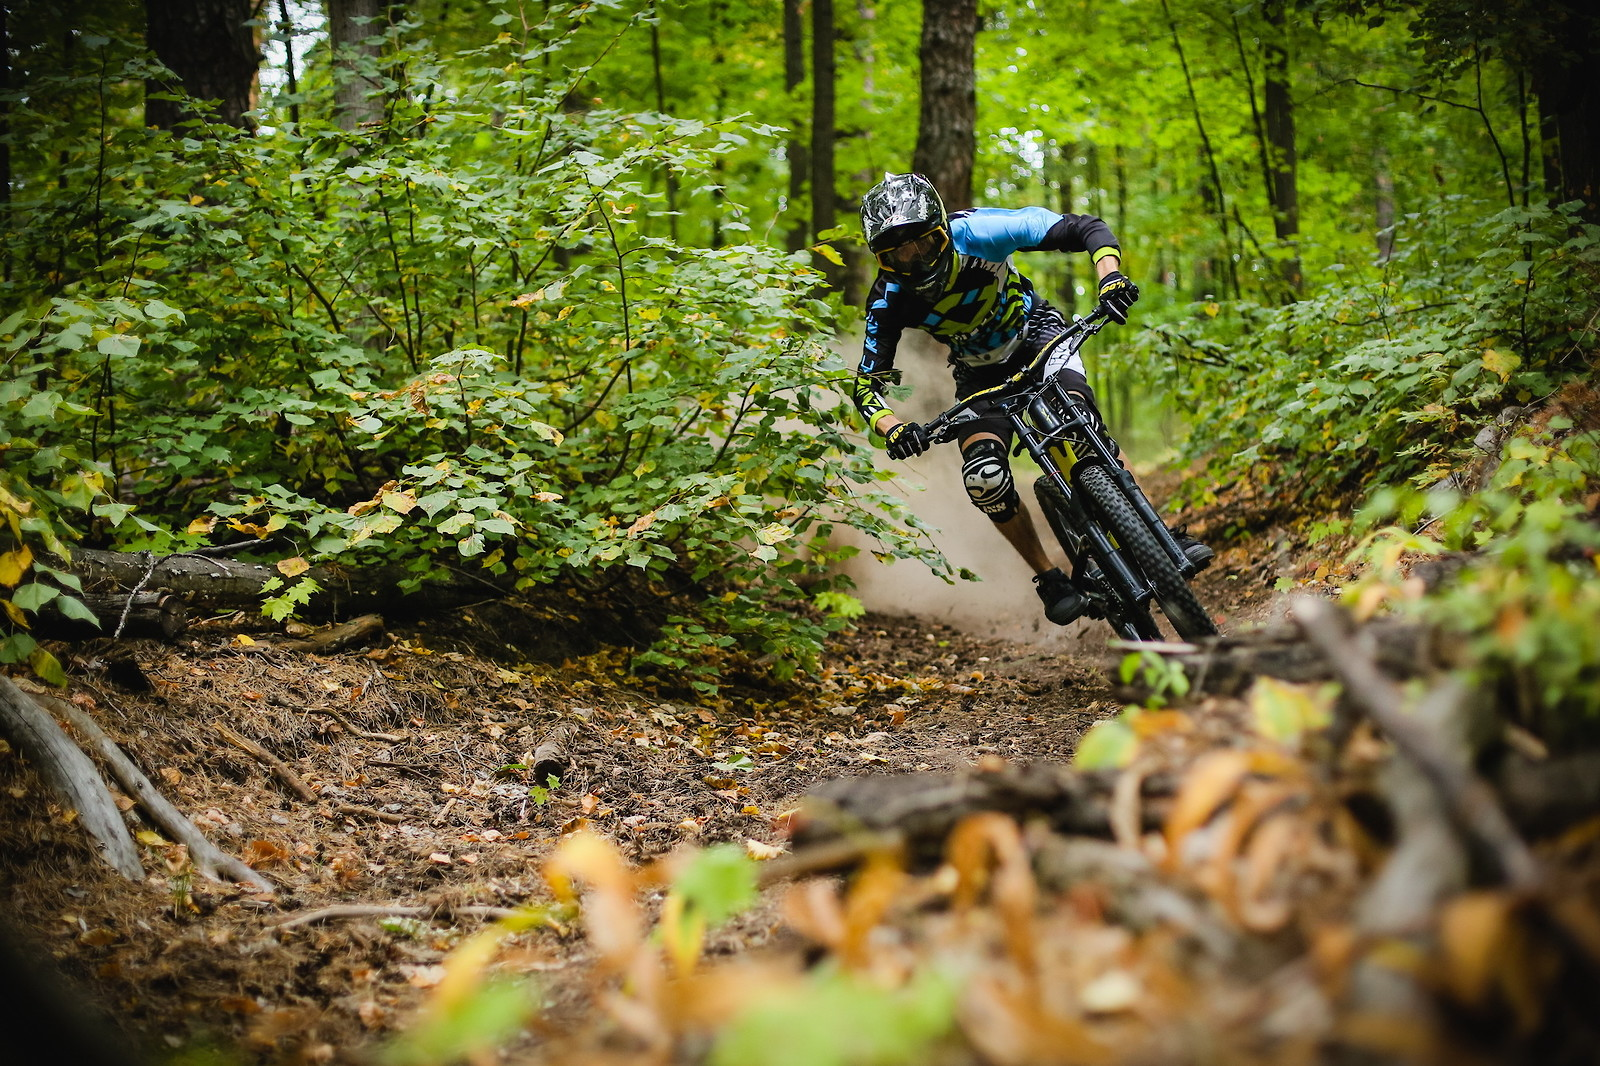 rushing to the fall - YakuT - Mountain Biking Pictures - Vital MTB